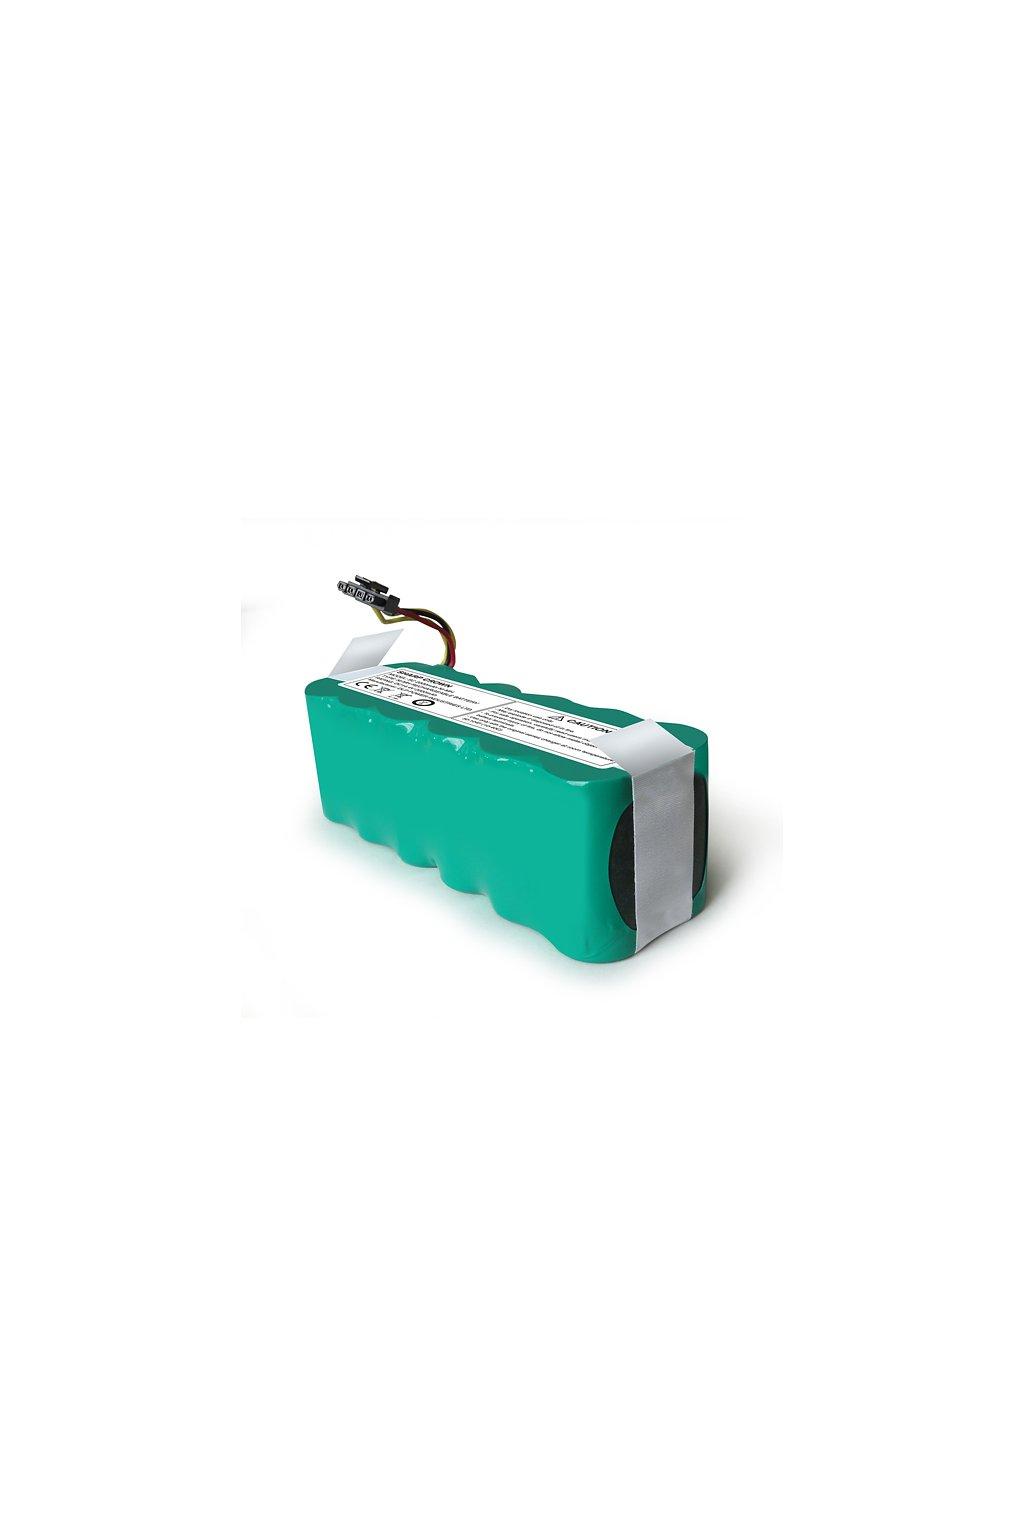 Tartalékakkumulátor Duoro Xclean (Ni-Mh 3000 mAh)